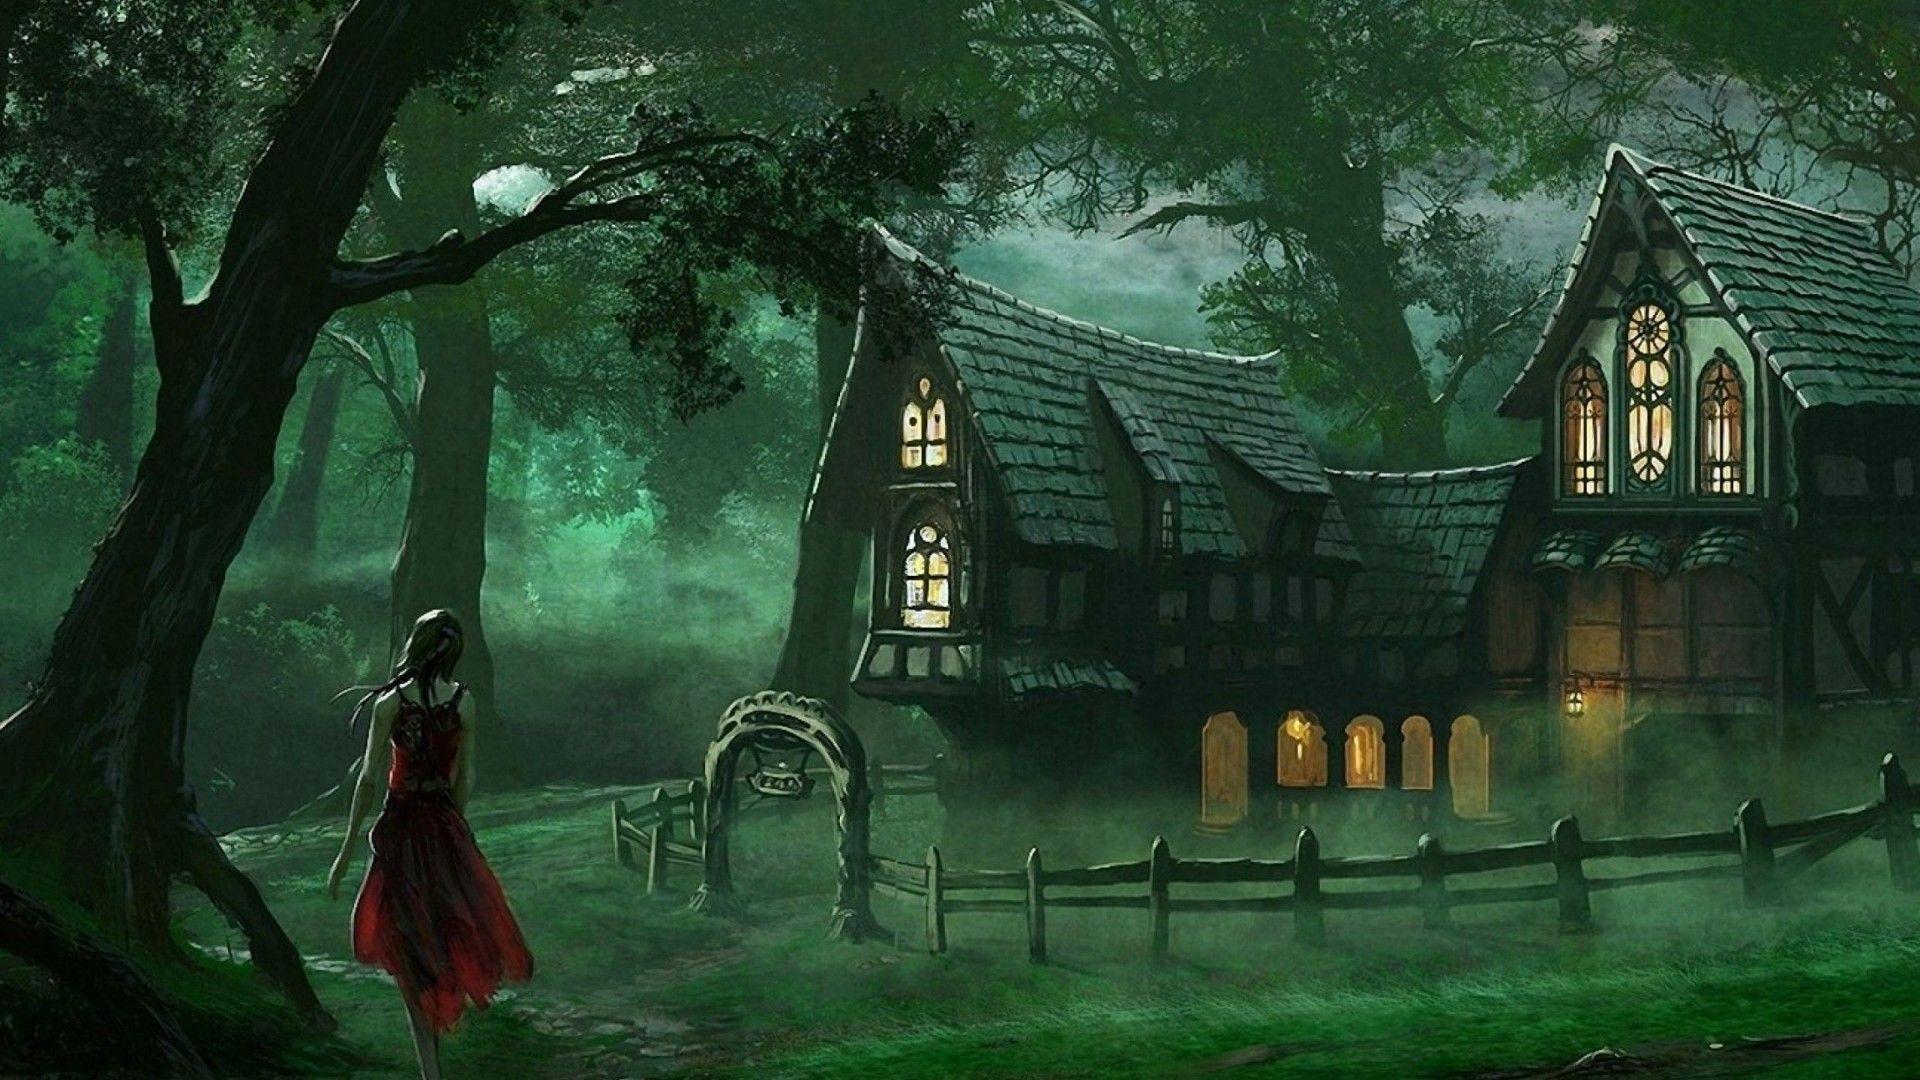 Spooky House Fantasy Forest Wallpaper HD 1920 1080